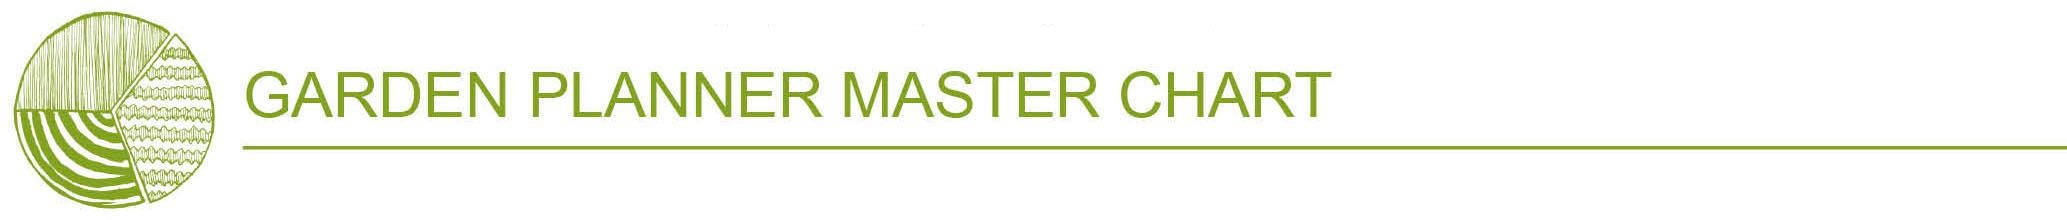 Garden_Planner_Worksheet_Masterchart2.jpg